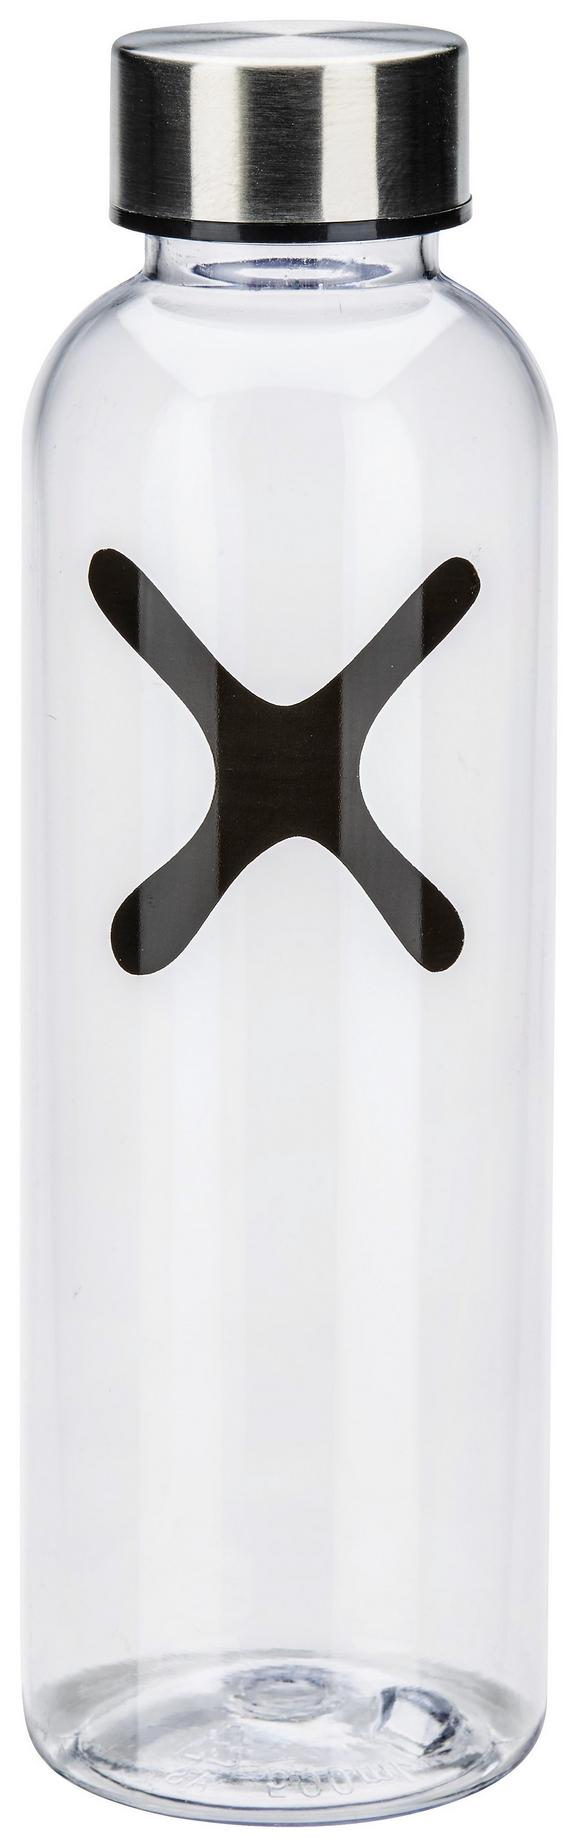 Trinkflasche Mömax 4 You Versch. Farben - Klar/Pink, Kunststoff/Metall (7/21cm) - Mömax modern living